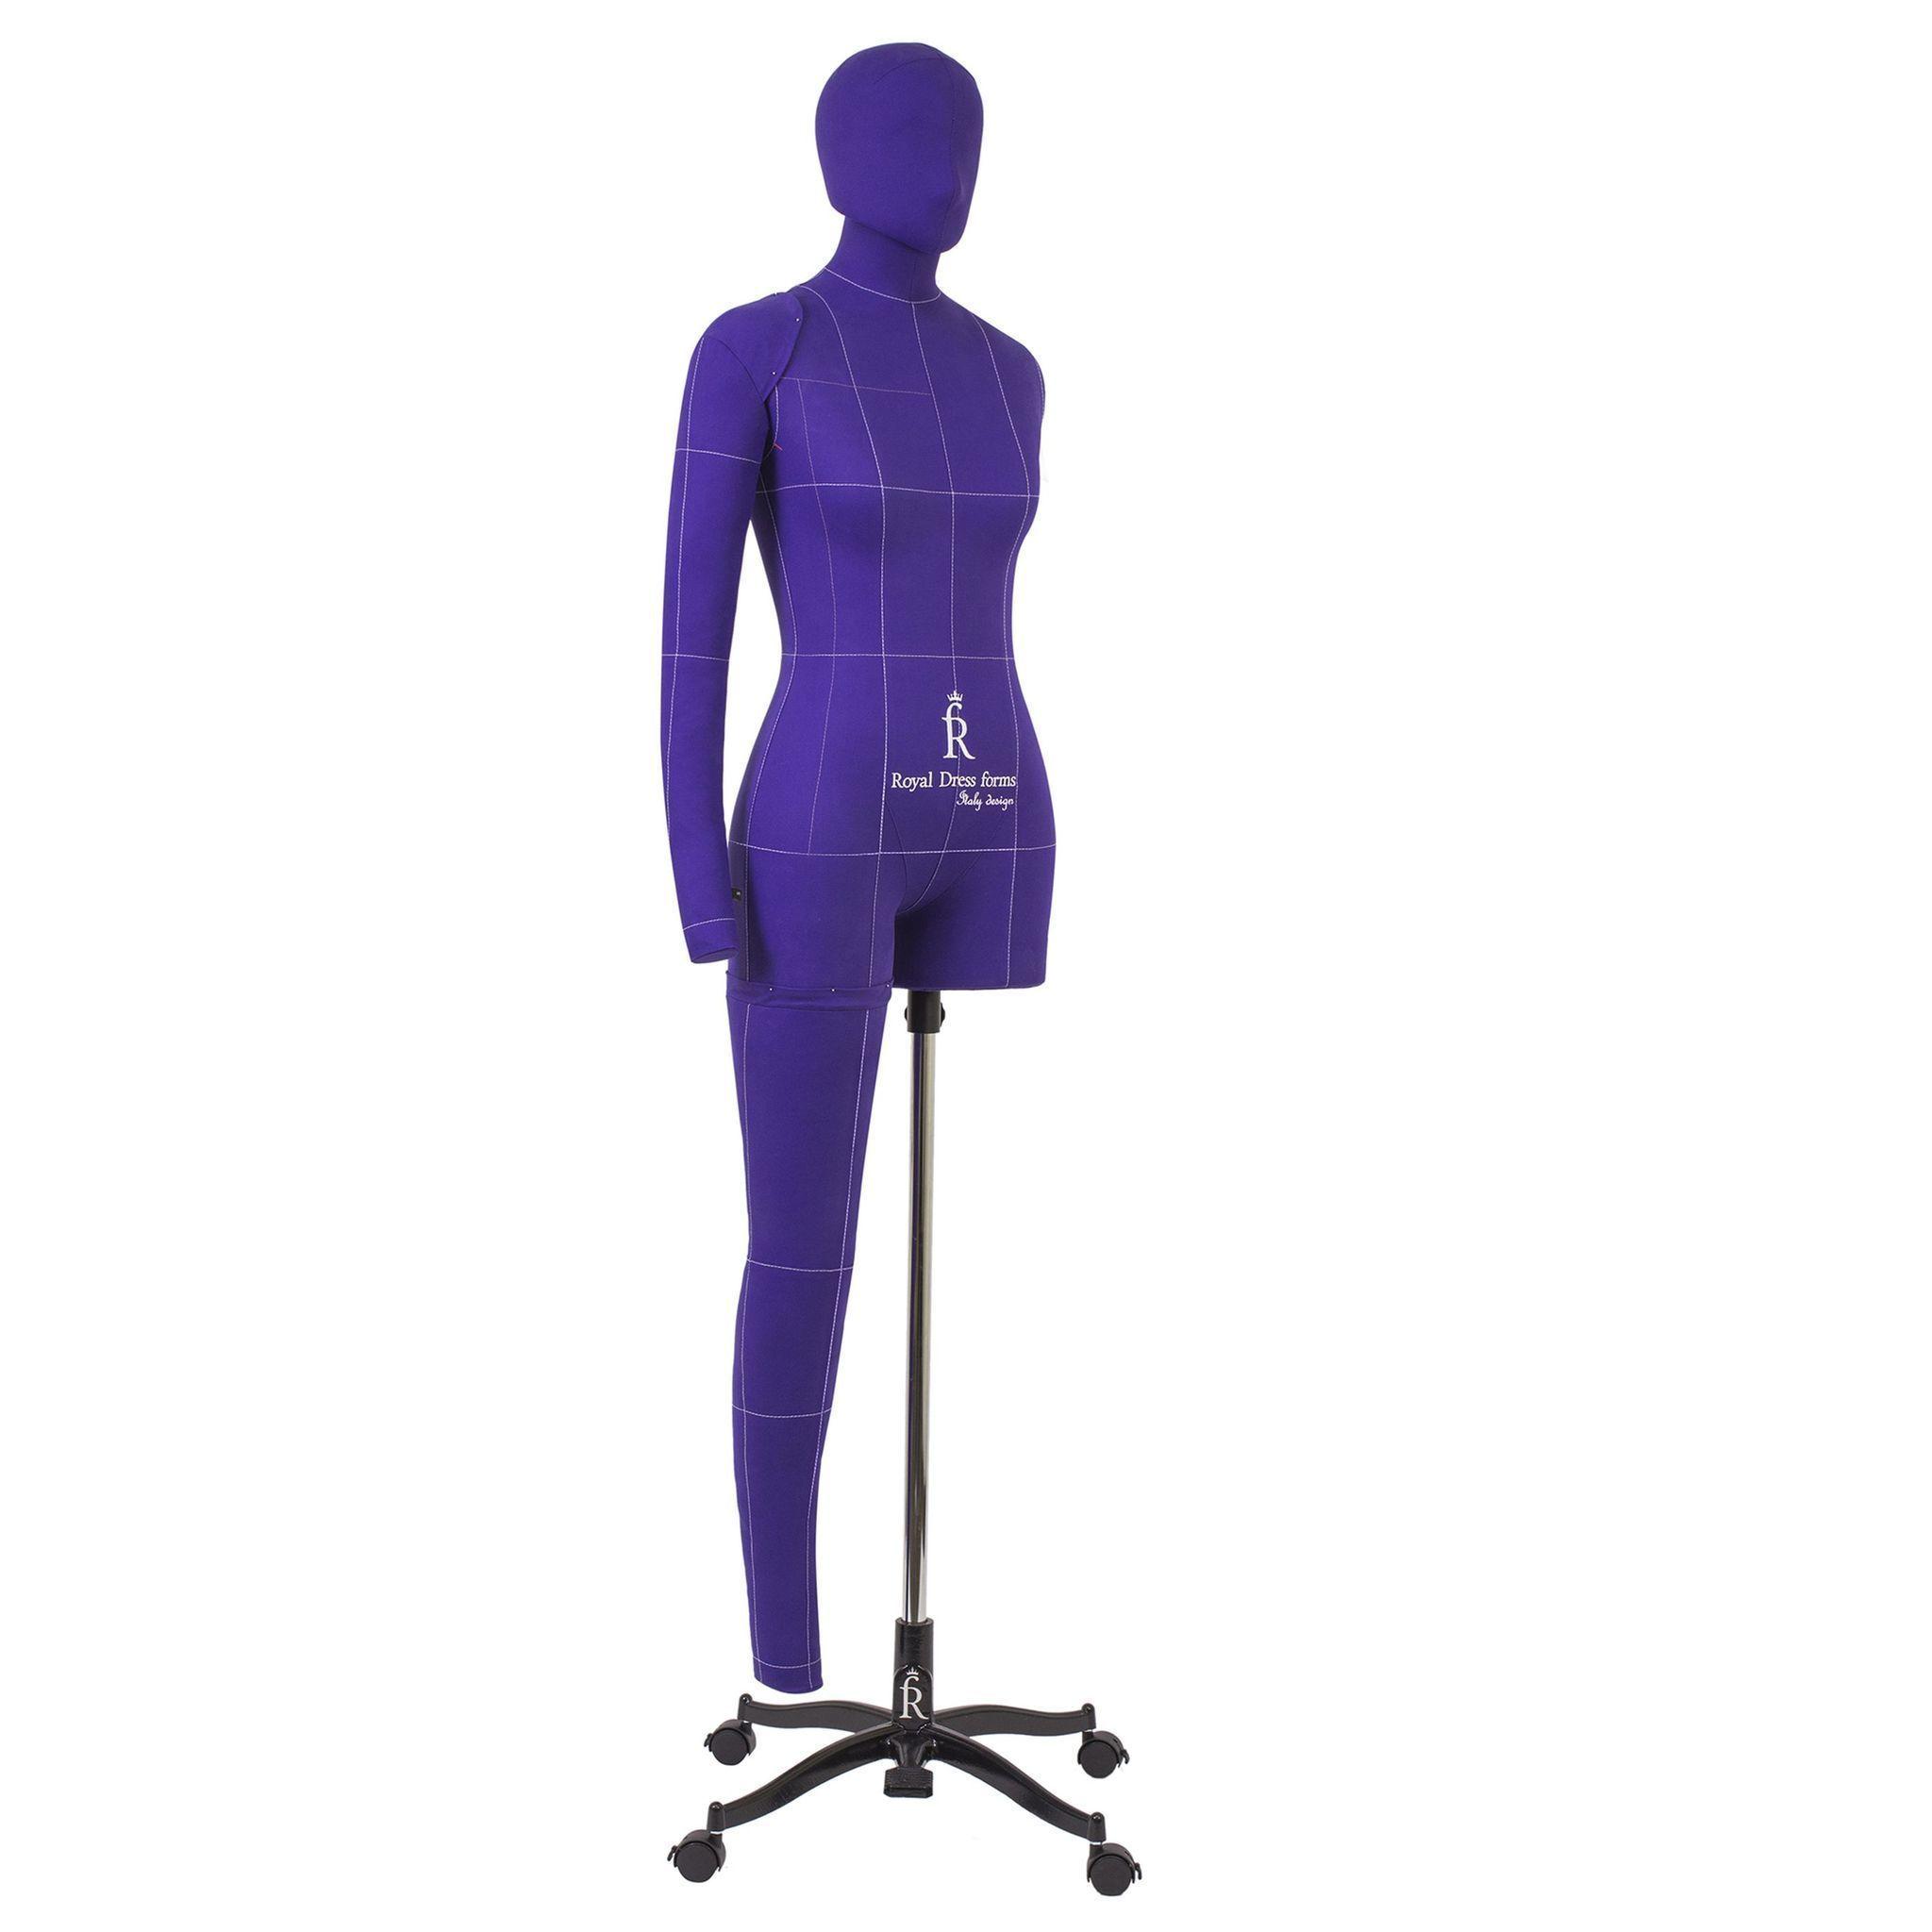 Манекен портновский Моника, комплект Арт, размер 50, ФиолетовыйФото 1